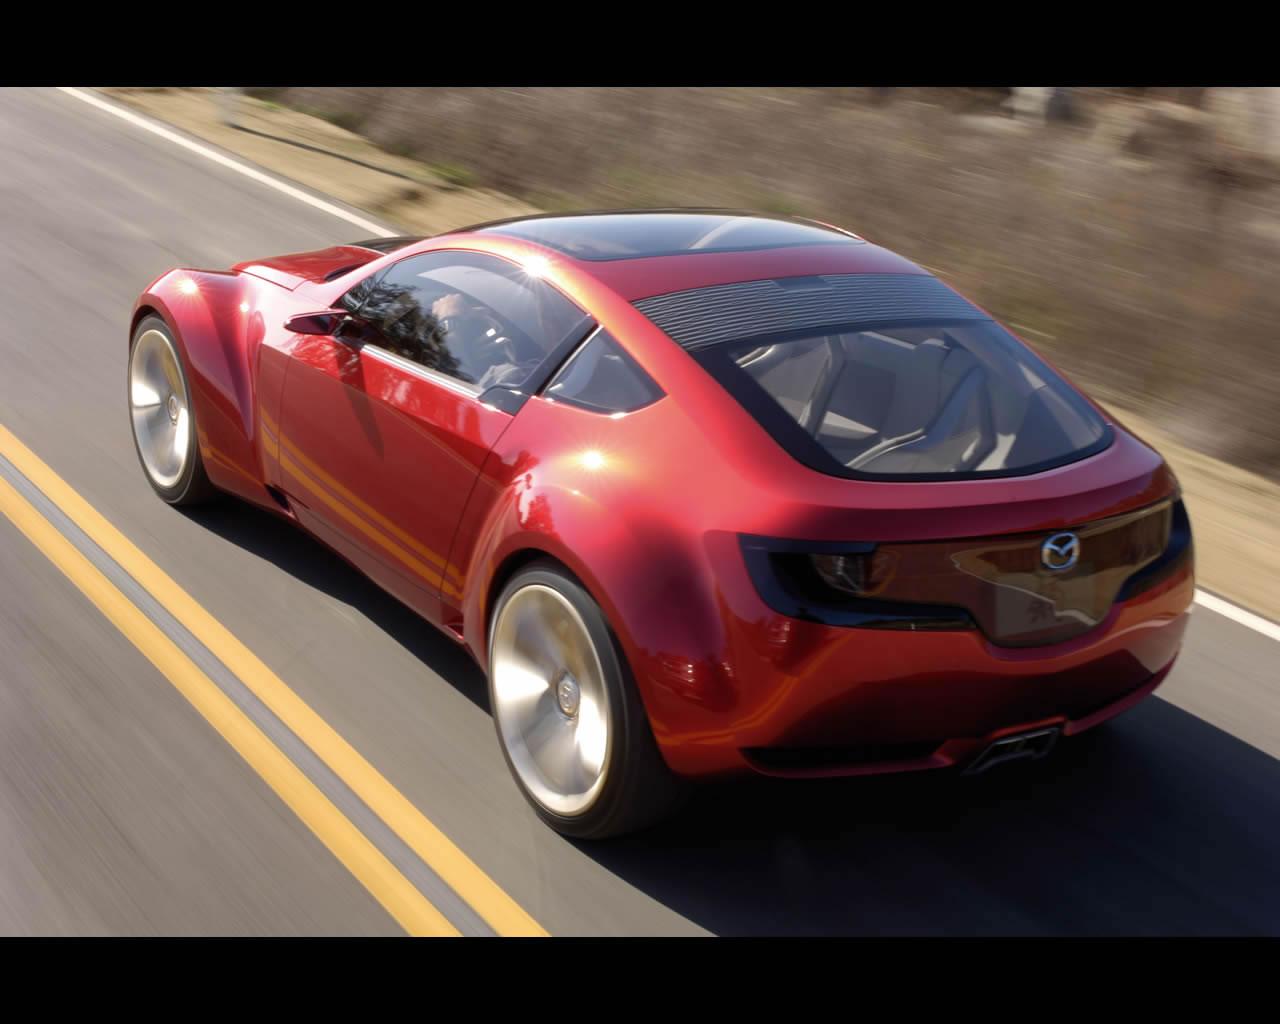 http://www.autoconcept-reviews.com/cars_reviews/mazda/mazda-kabura/wallpaper/Mazda_Kabura_2006_03_print.jpg